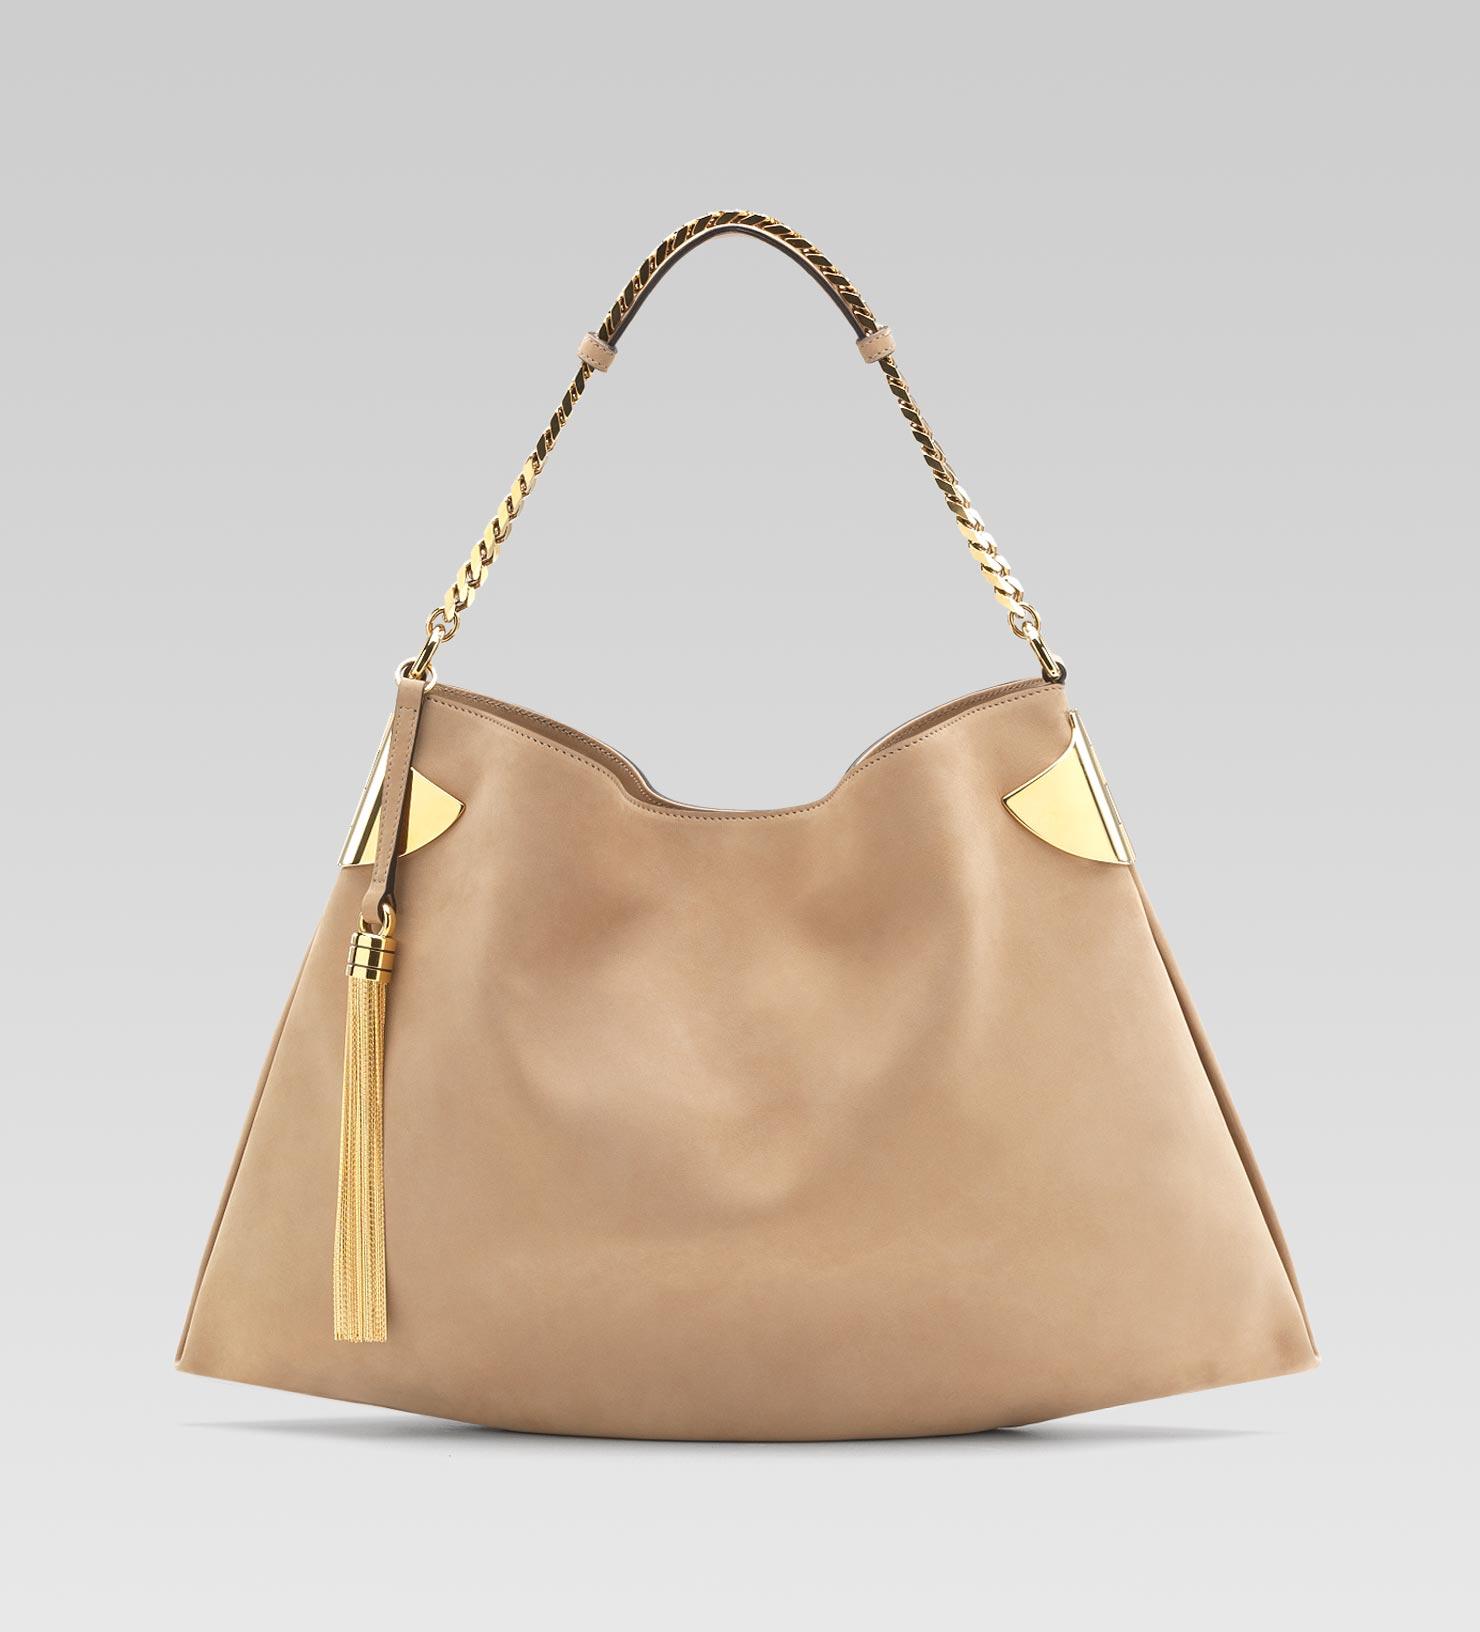 Lyst - Gucci Gucci Shoulder Bag in Natural